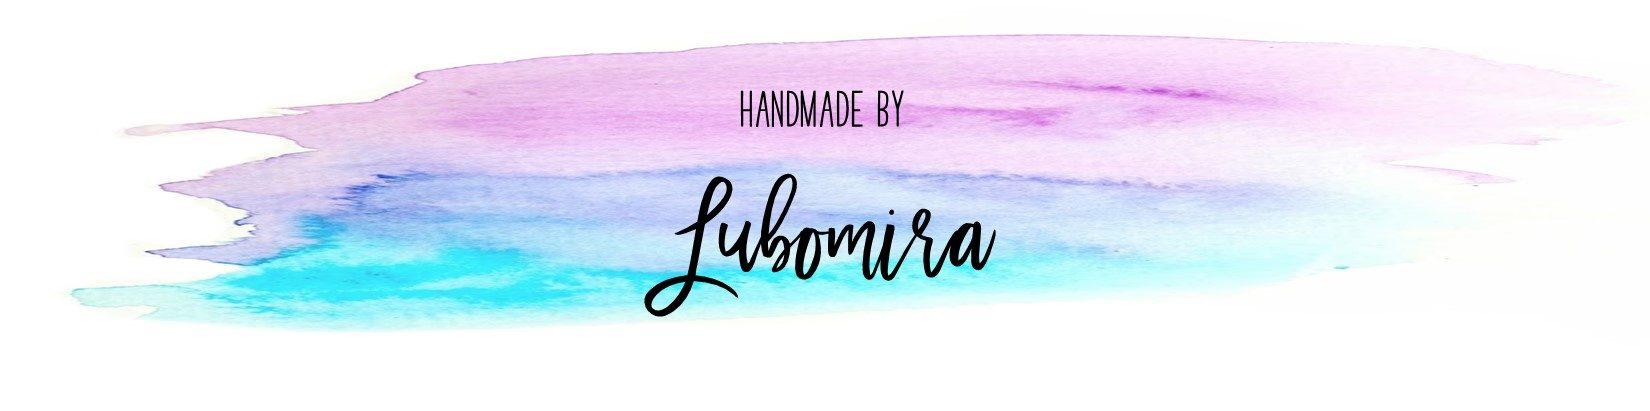 Handmade by Lubomira